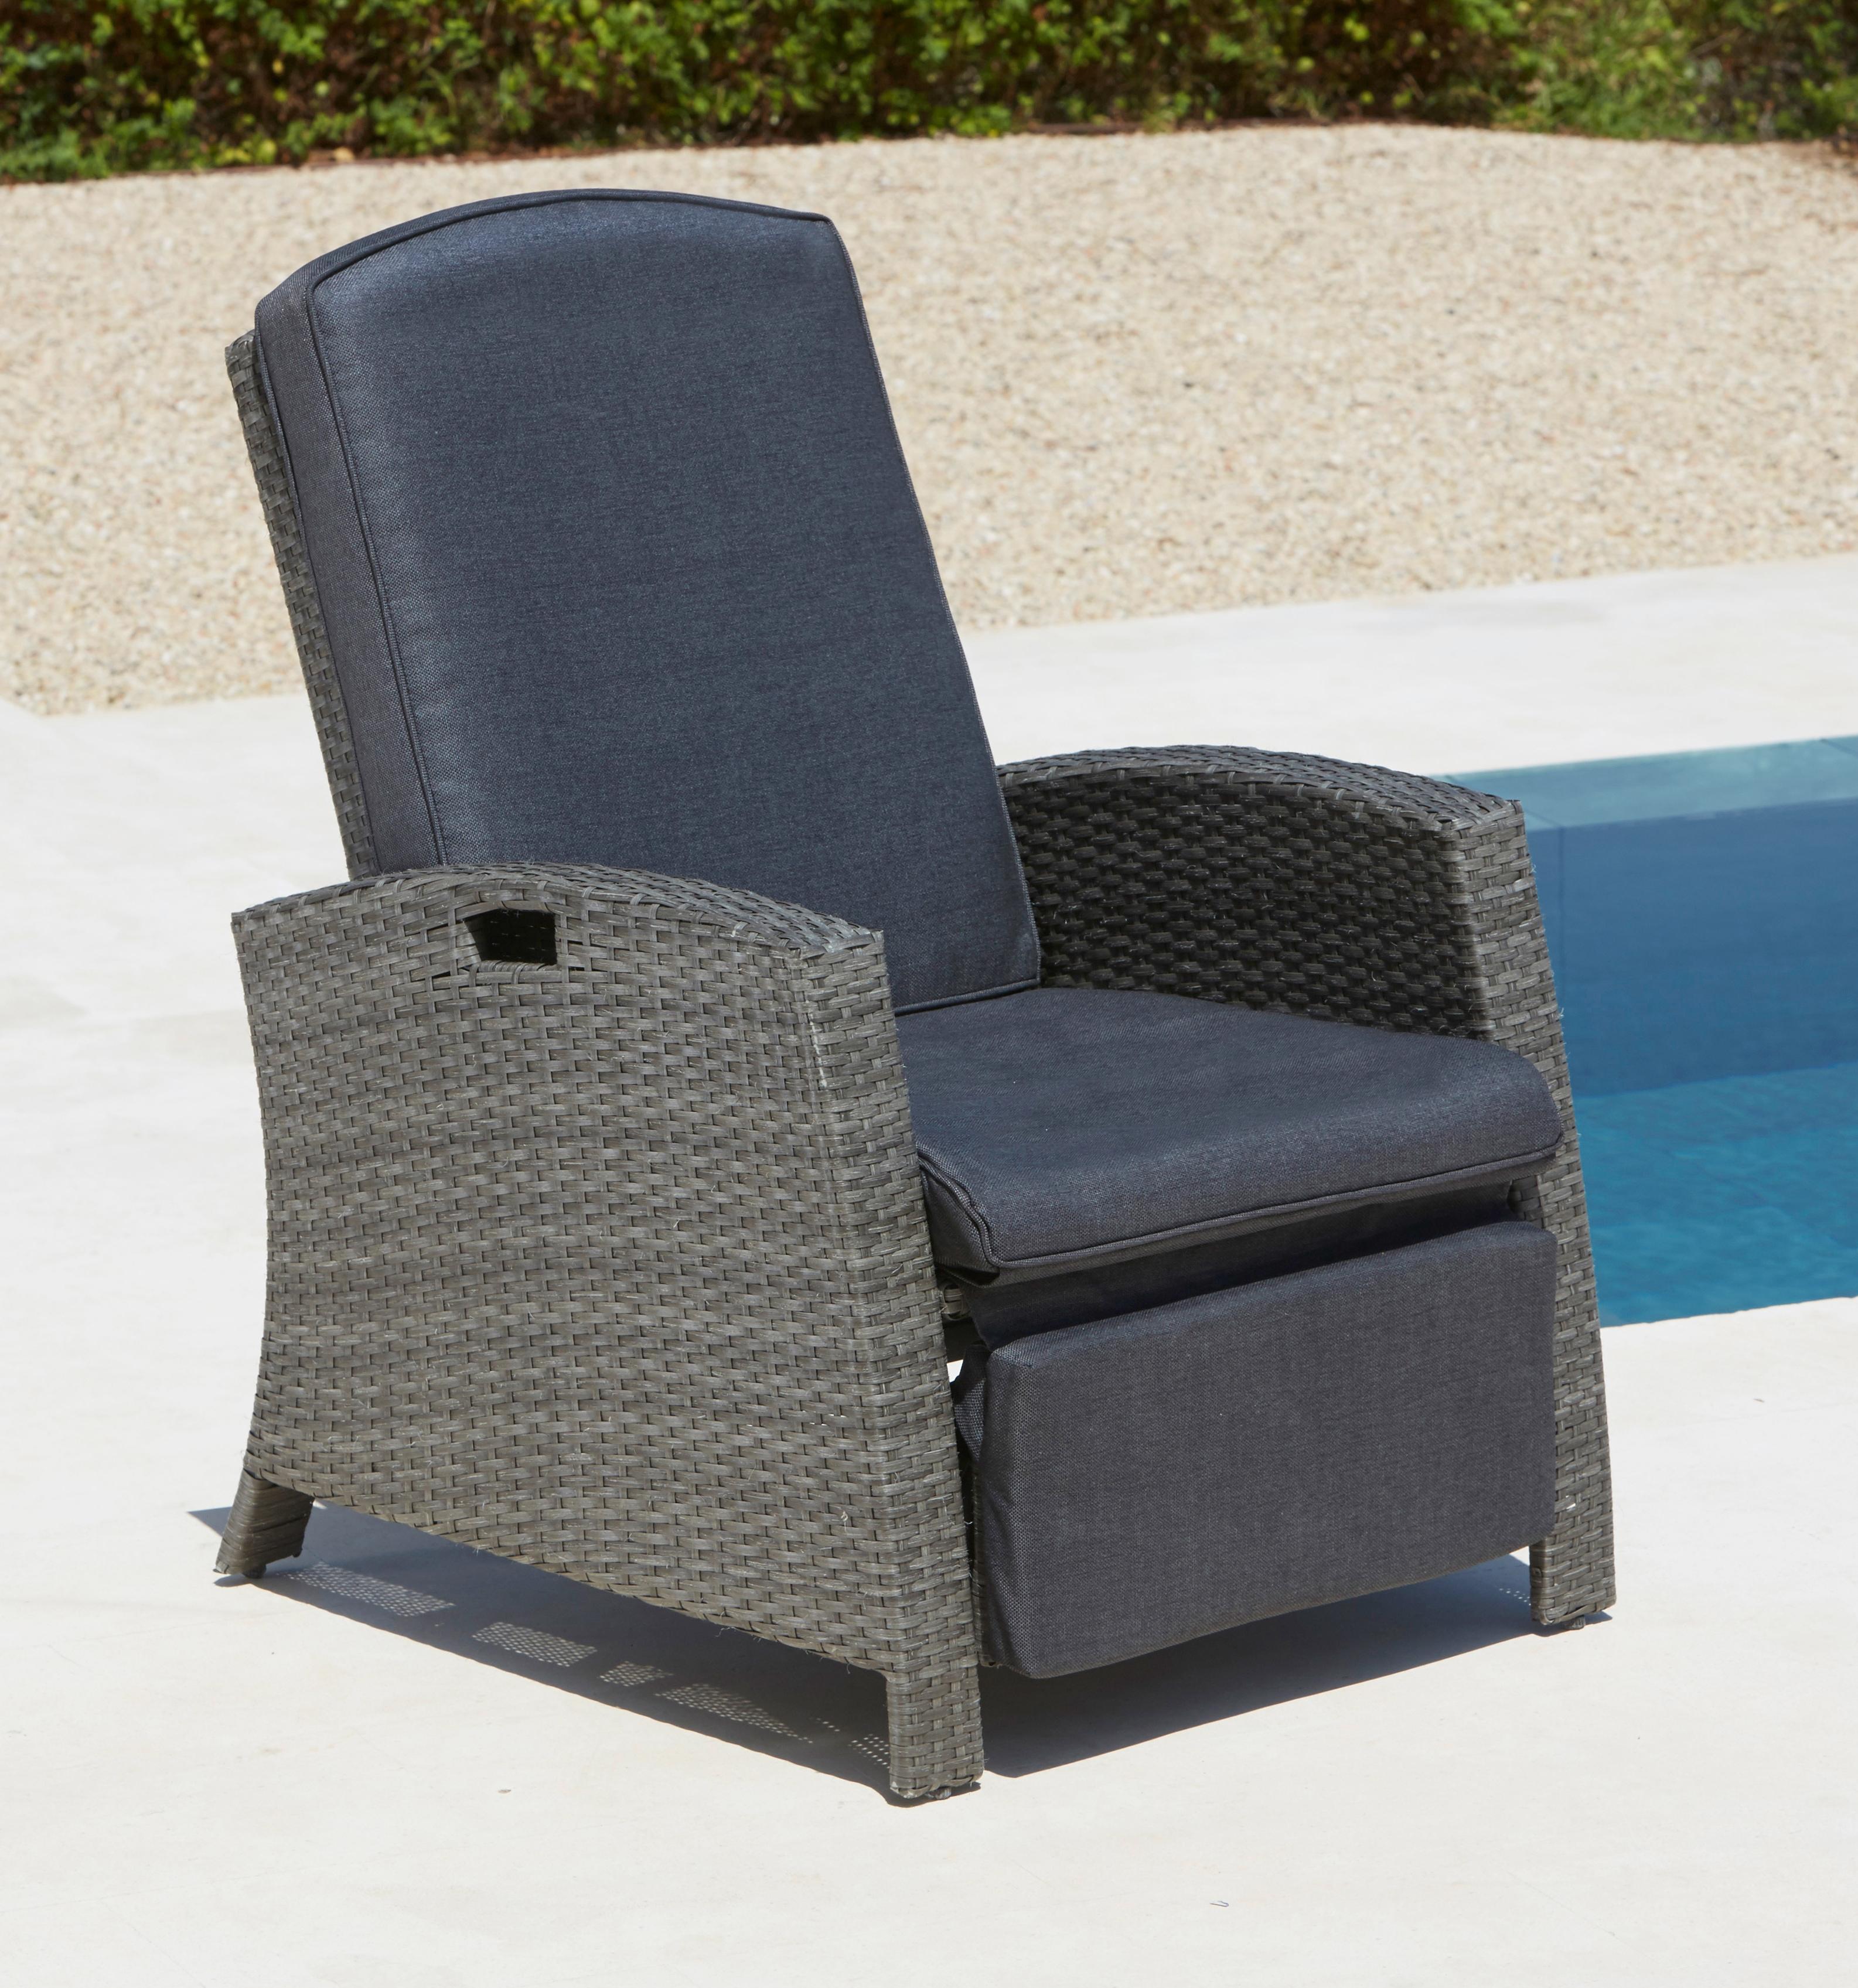 KONIFERA Relaxsessel Polyrattan verstellbar inkl Auflagen